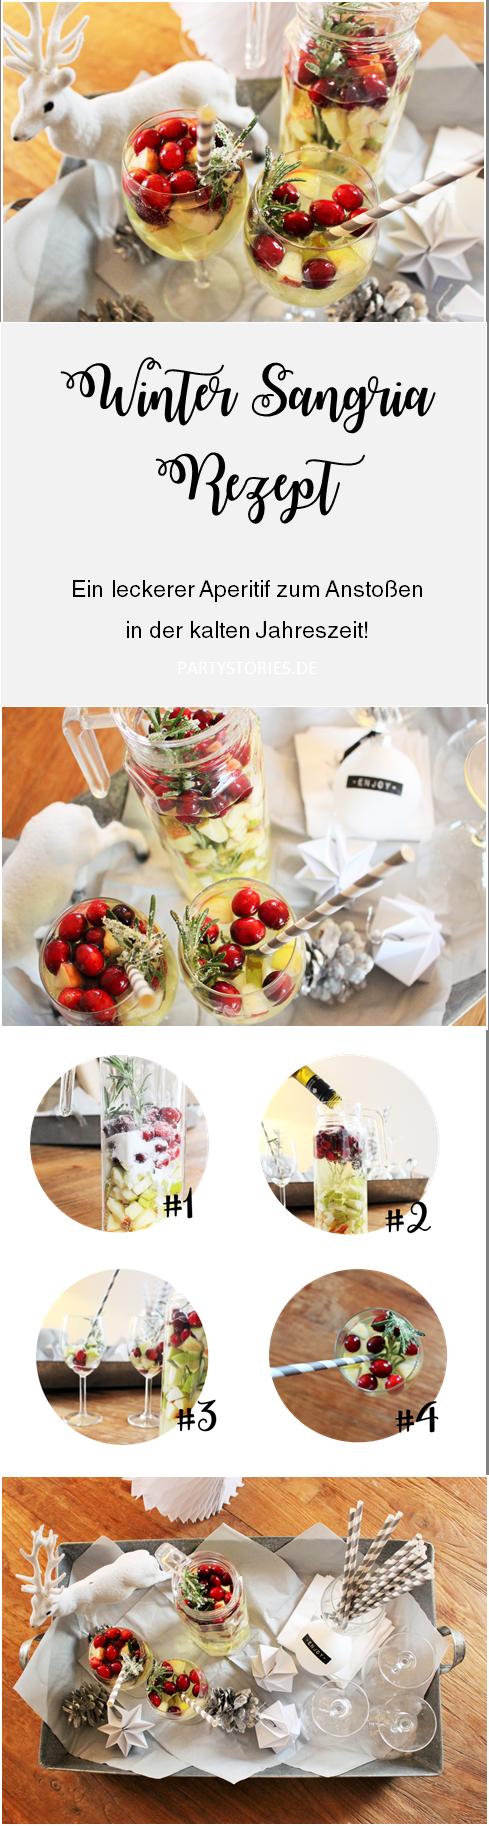 Sangria Rezept mal anders: Winter Sangria | Getränke | Pinterest ...